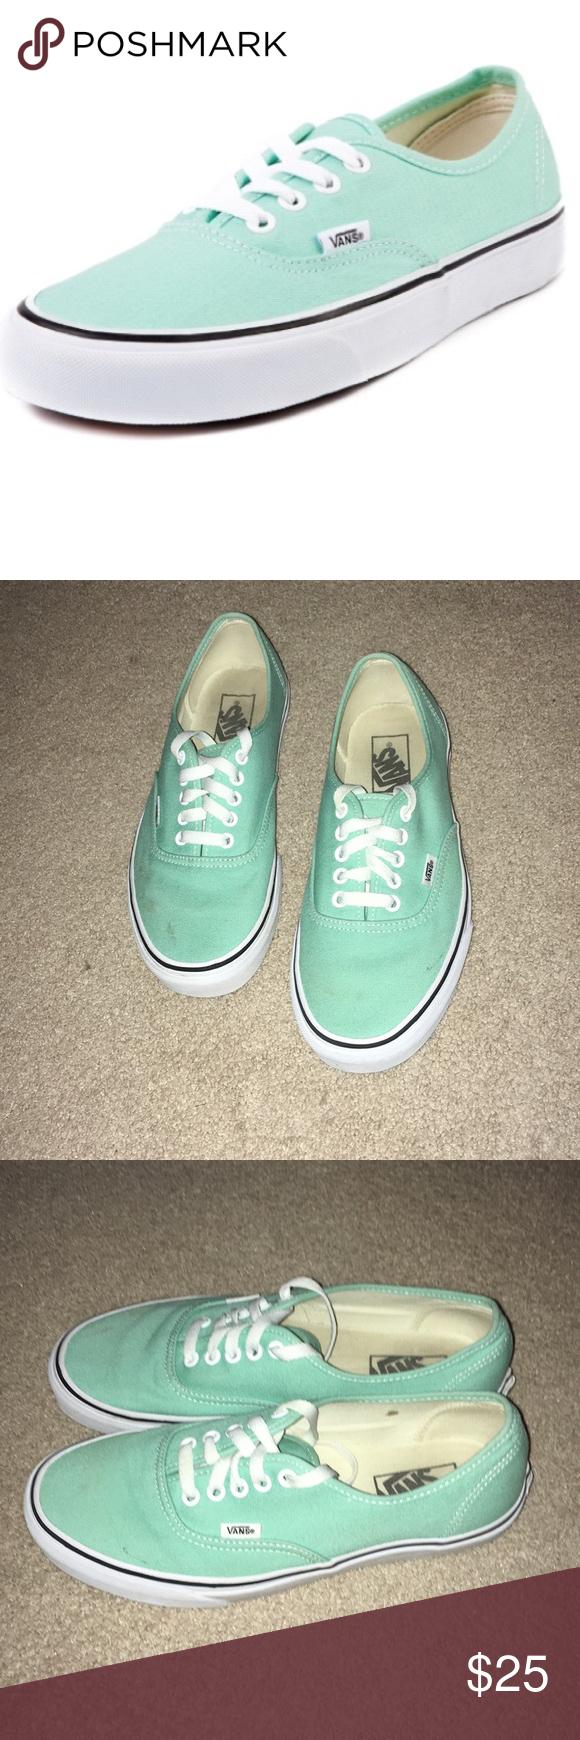 Vans! Teal light green mint Lace Up